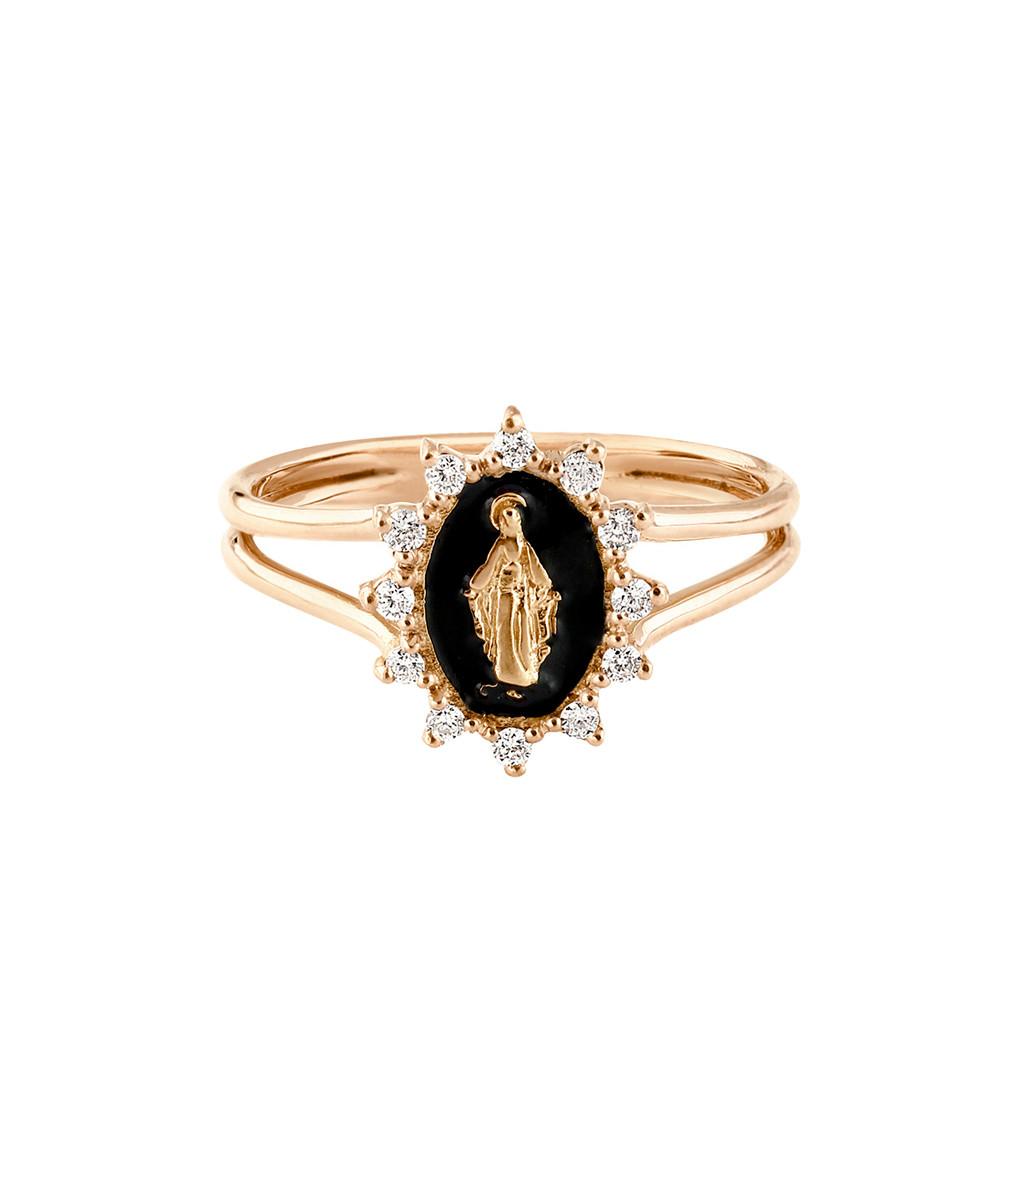 GIGI CLOZEAU - Bague Madone Suprême Or Diamants